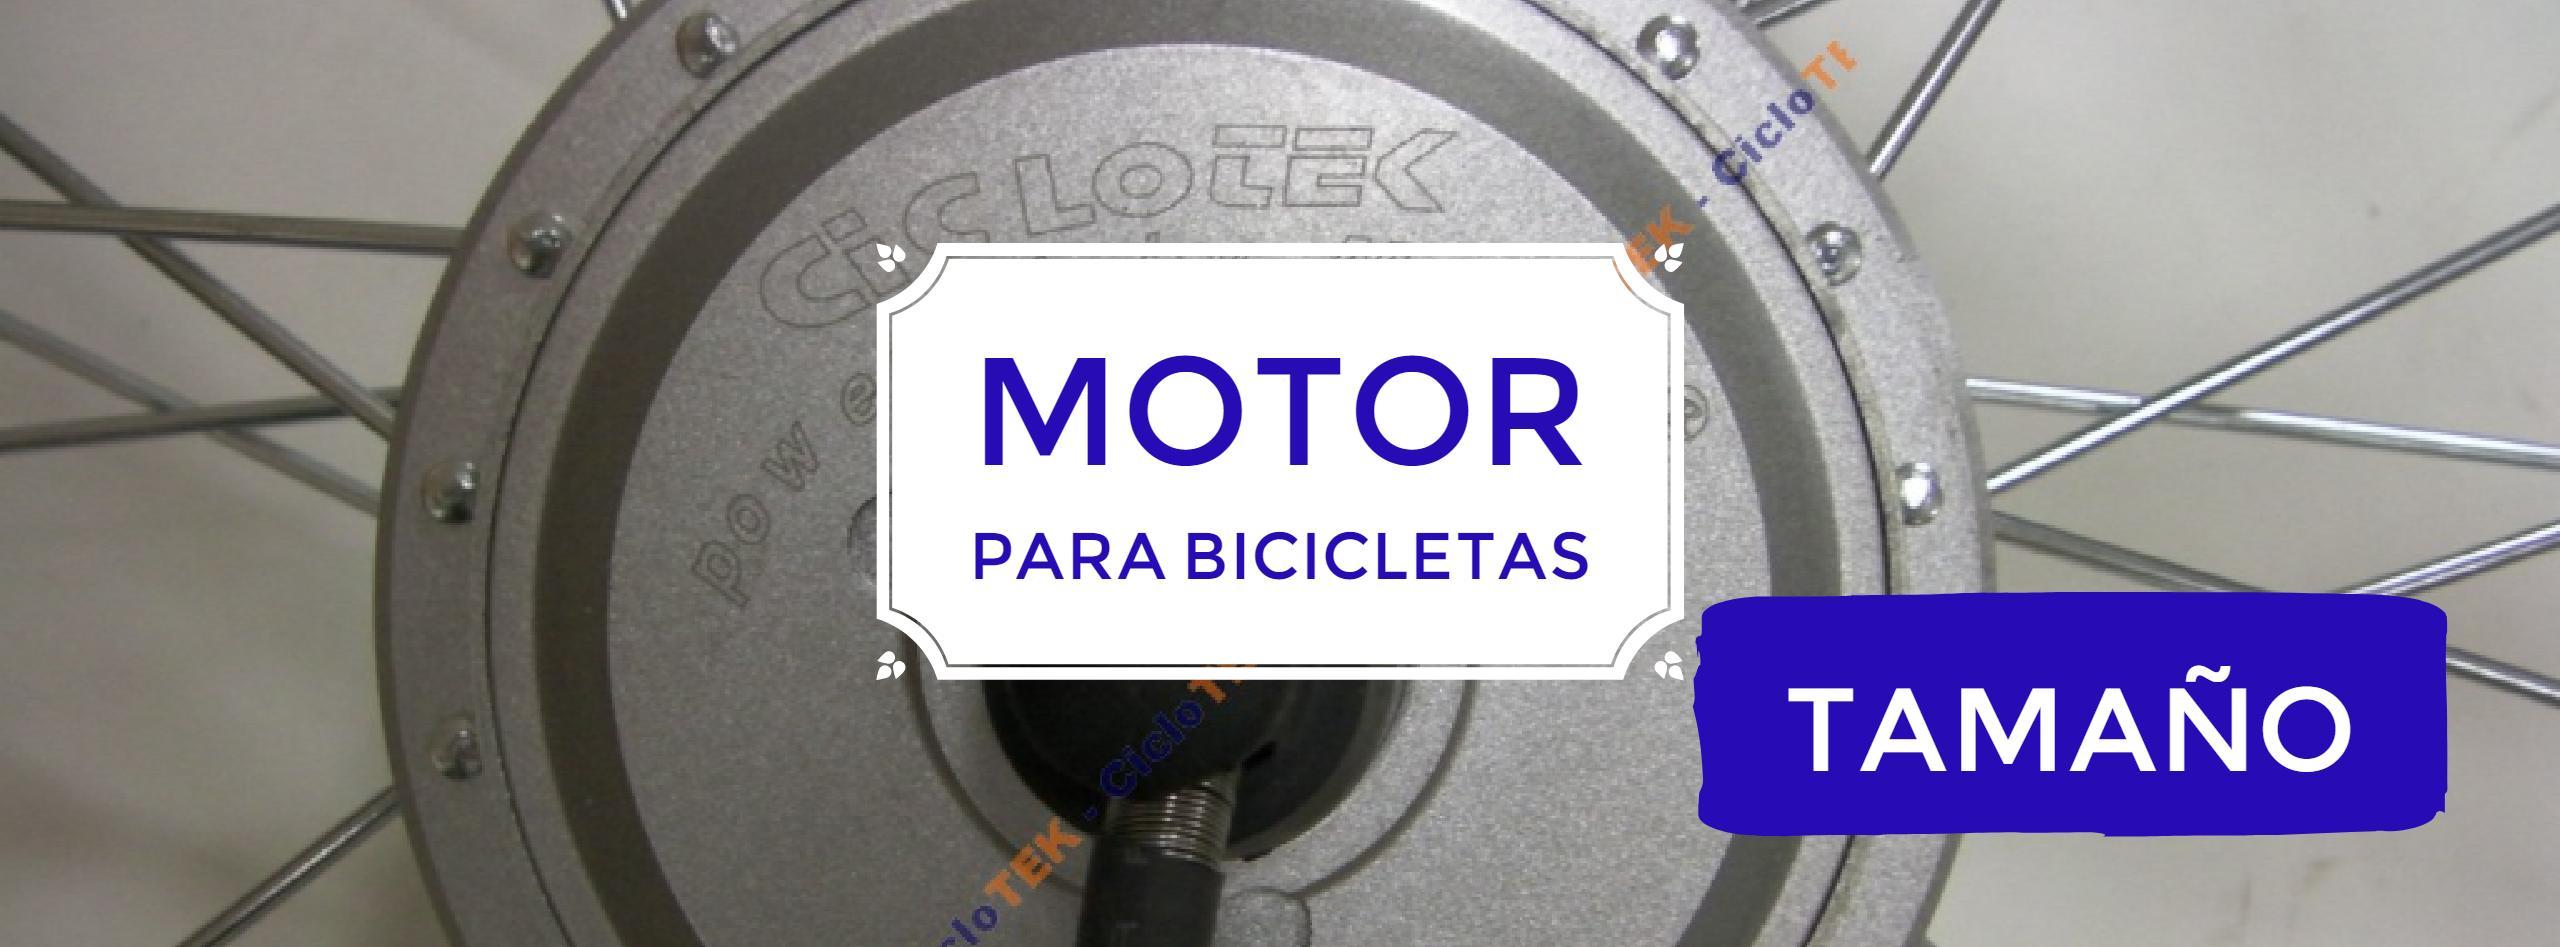 - Motor para bicicleta